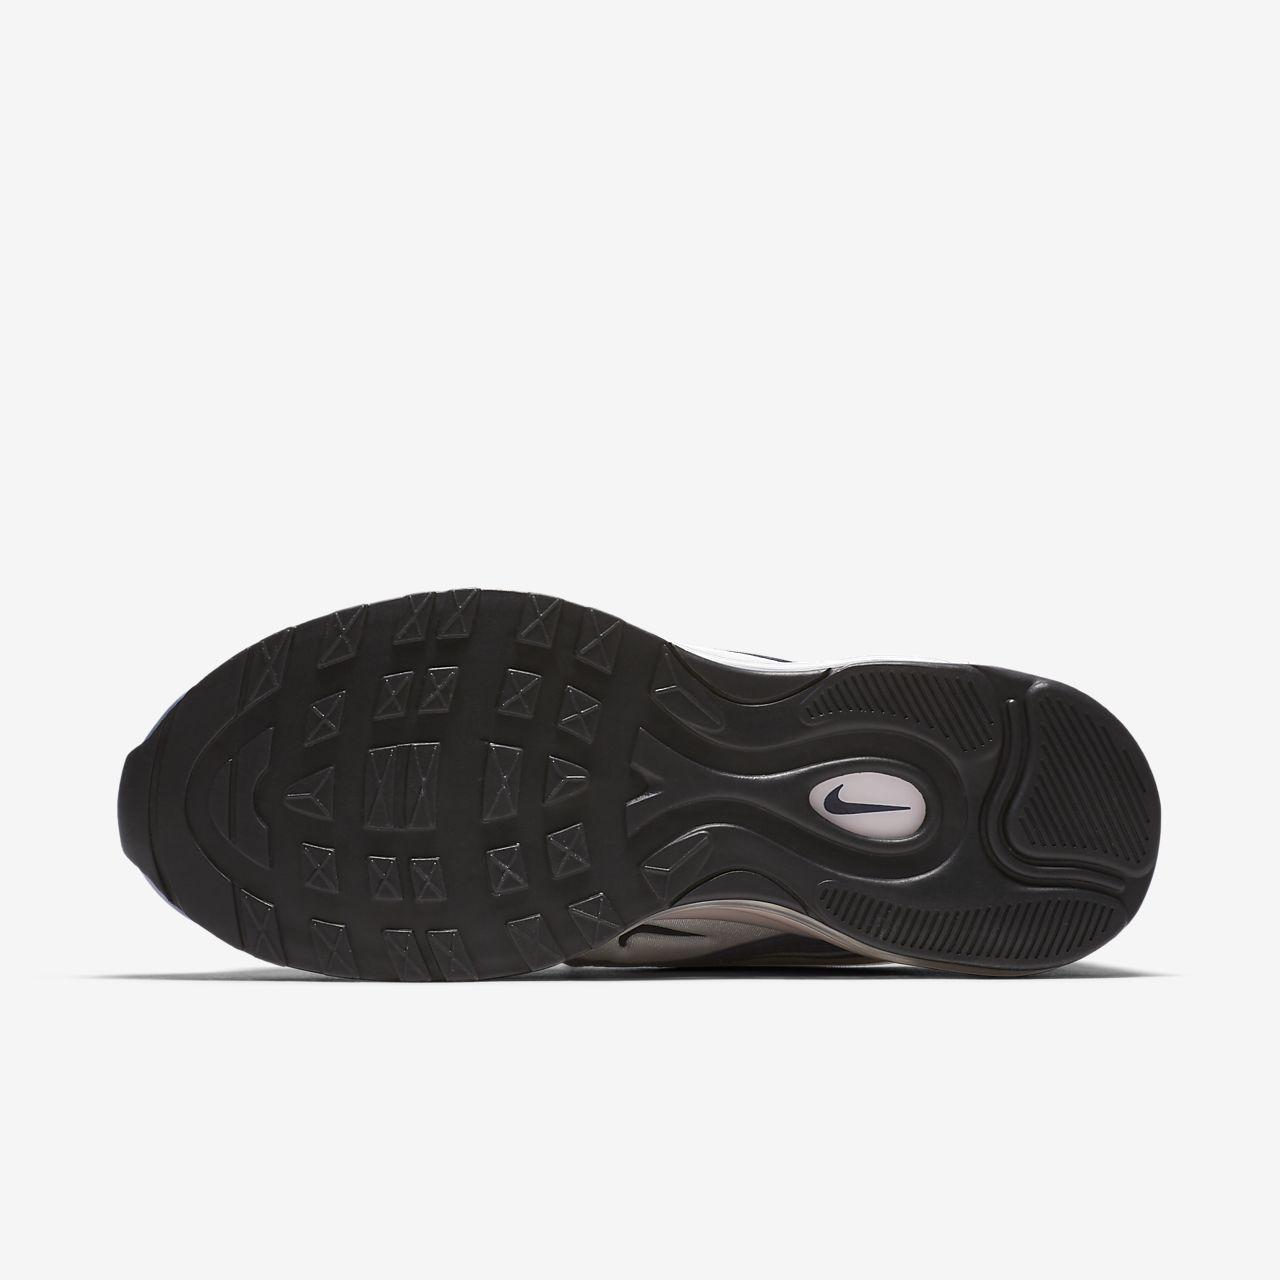 639f0c826d Nike Air Max 97 Ultra '17 Women's Shoe. Nike.com MY